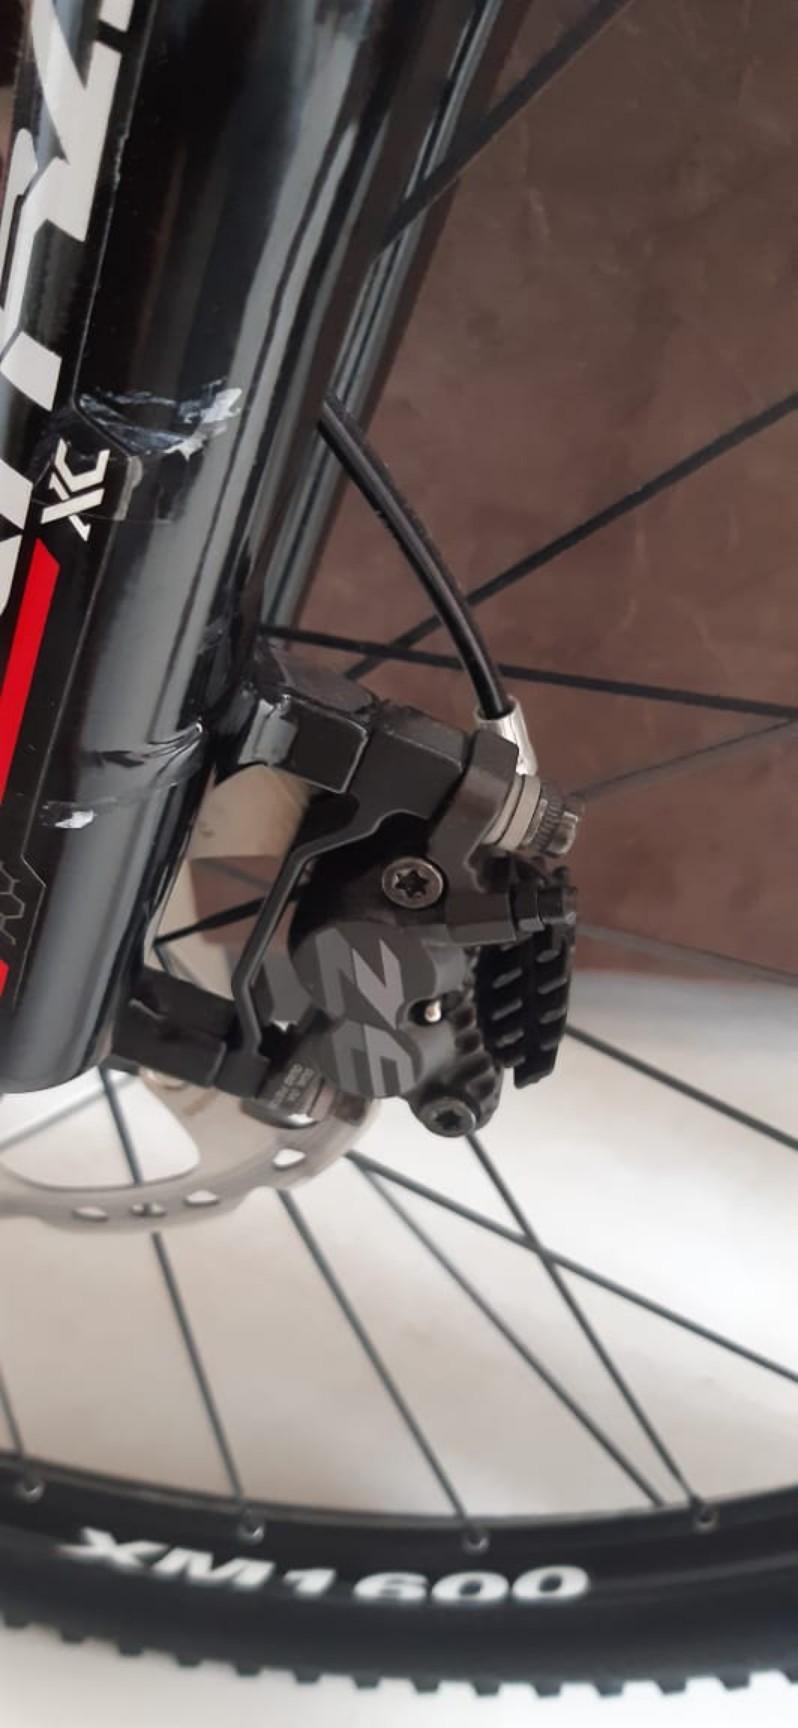 Bicicleta TSW AWE aro 29 SEMI NOVA - 30v Shimano Deore - Freios Shimano ZEE - Suspensão ProShock Ultra XC a AR